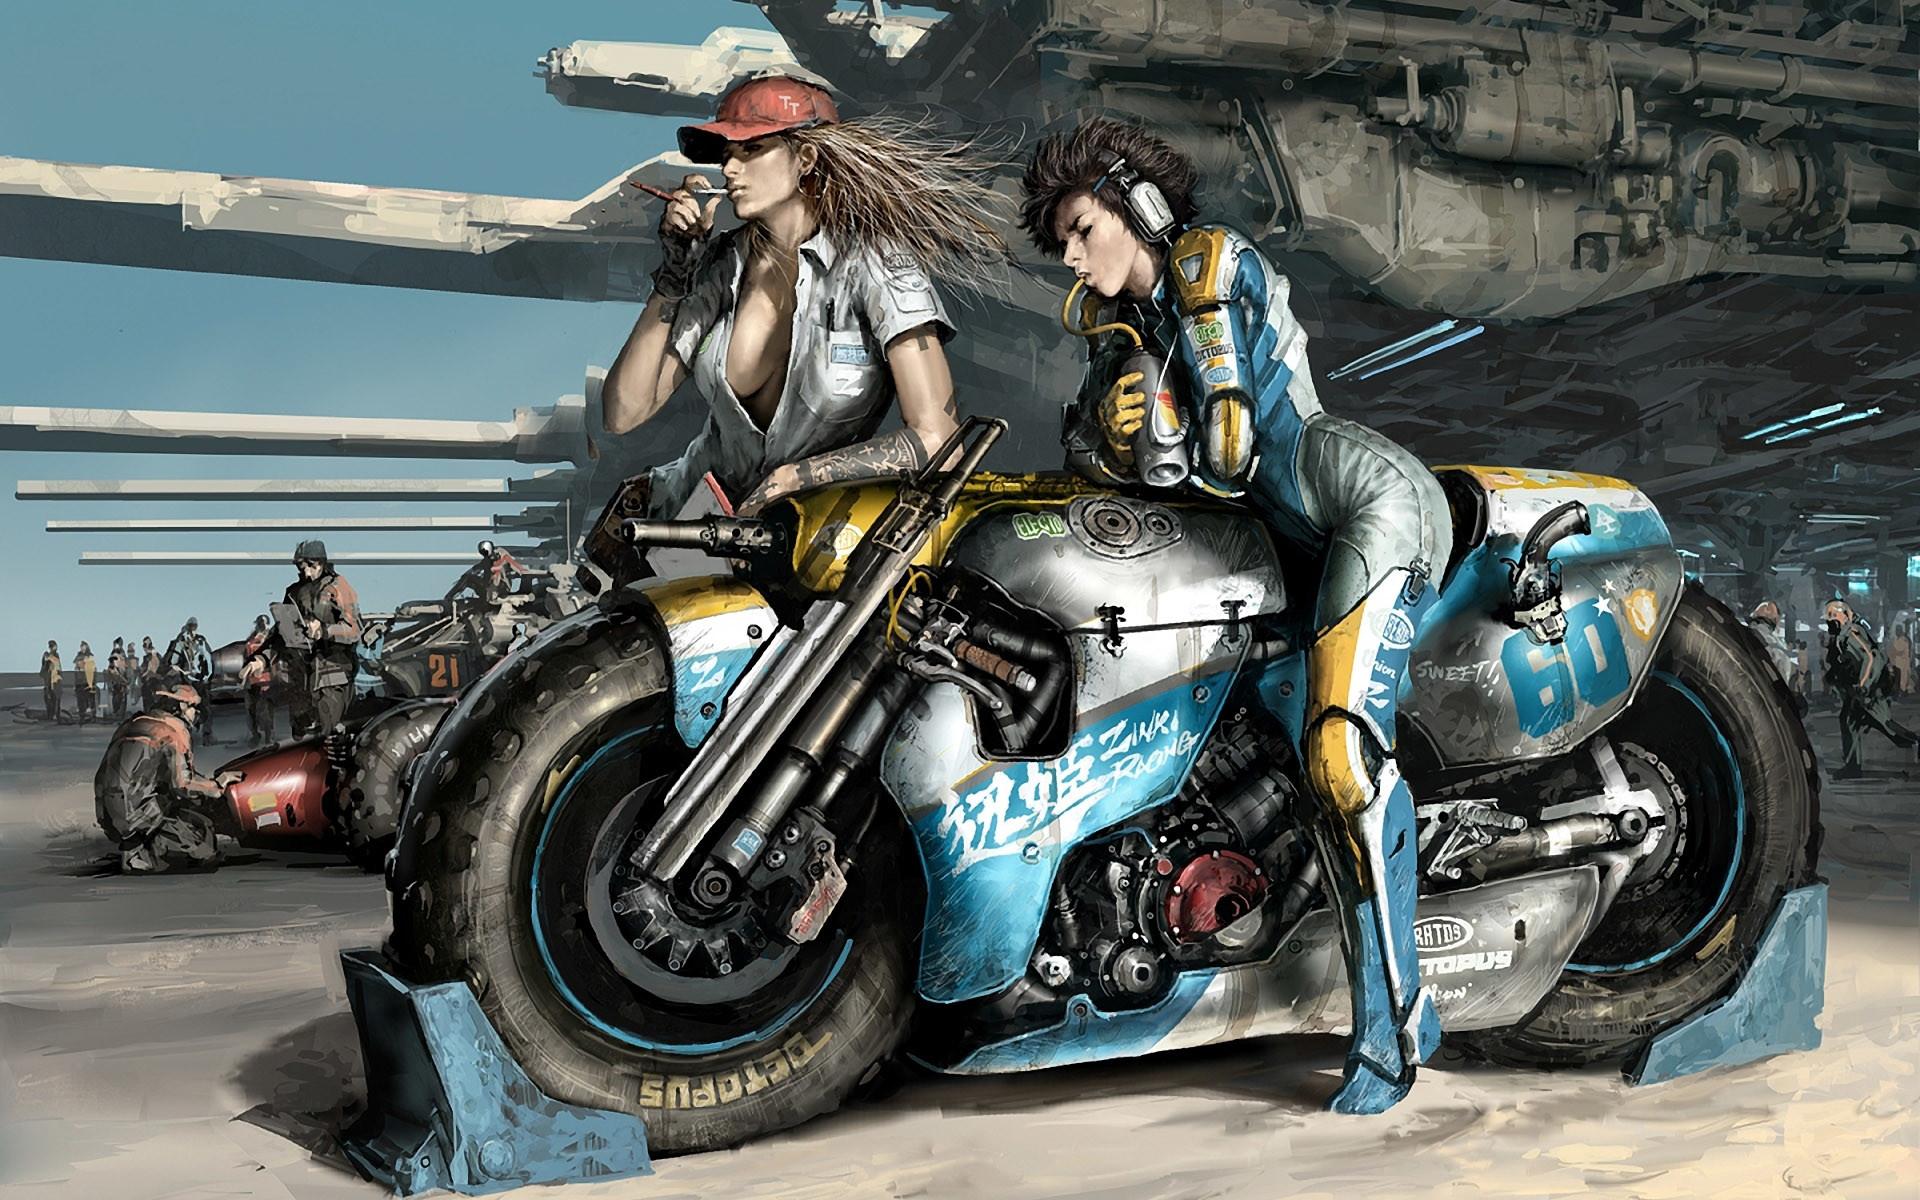 Wipeout Artwork Motorbikes Girls With Bikes Fresh New Hd Wallpaper